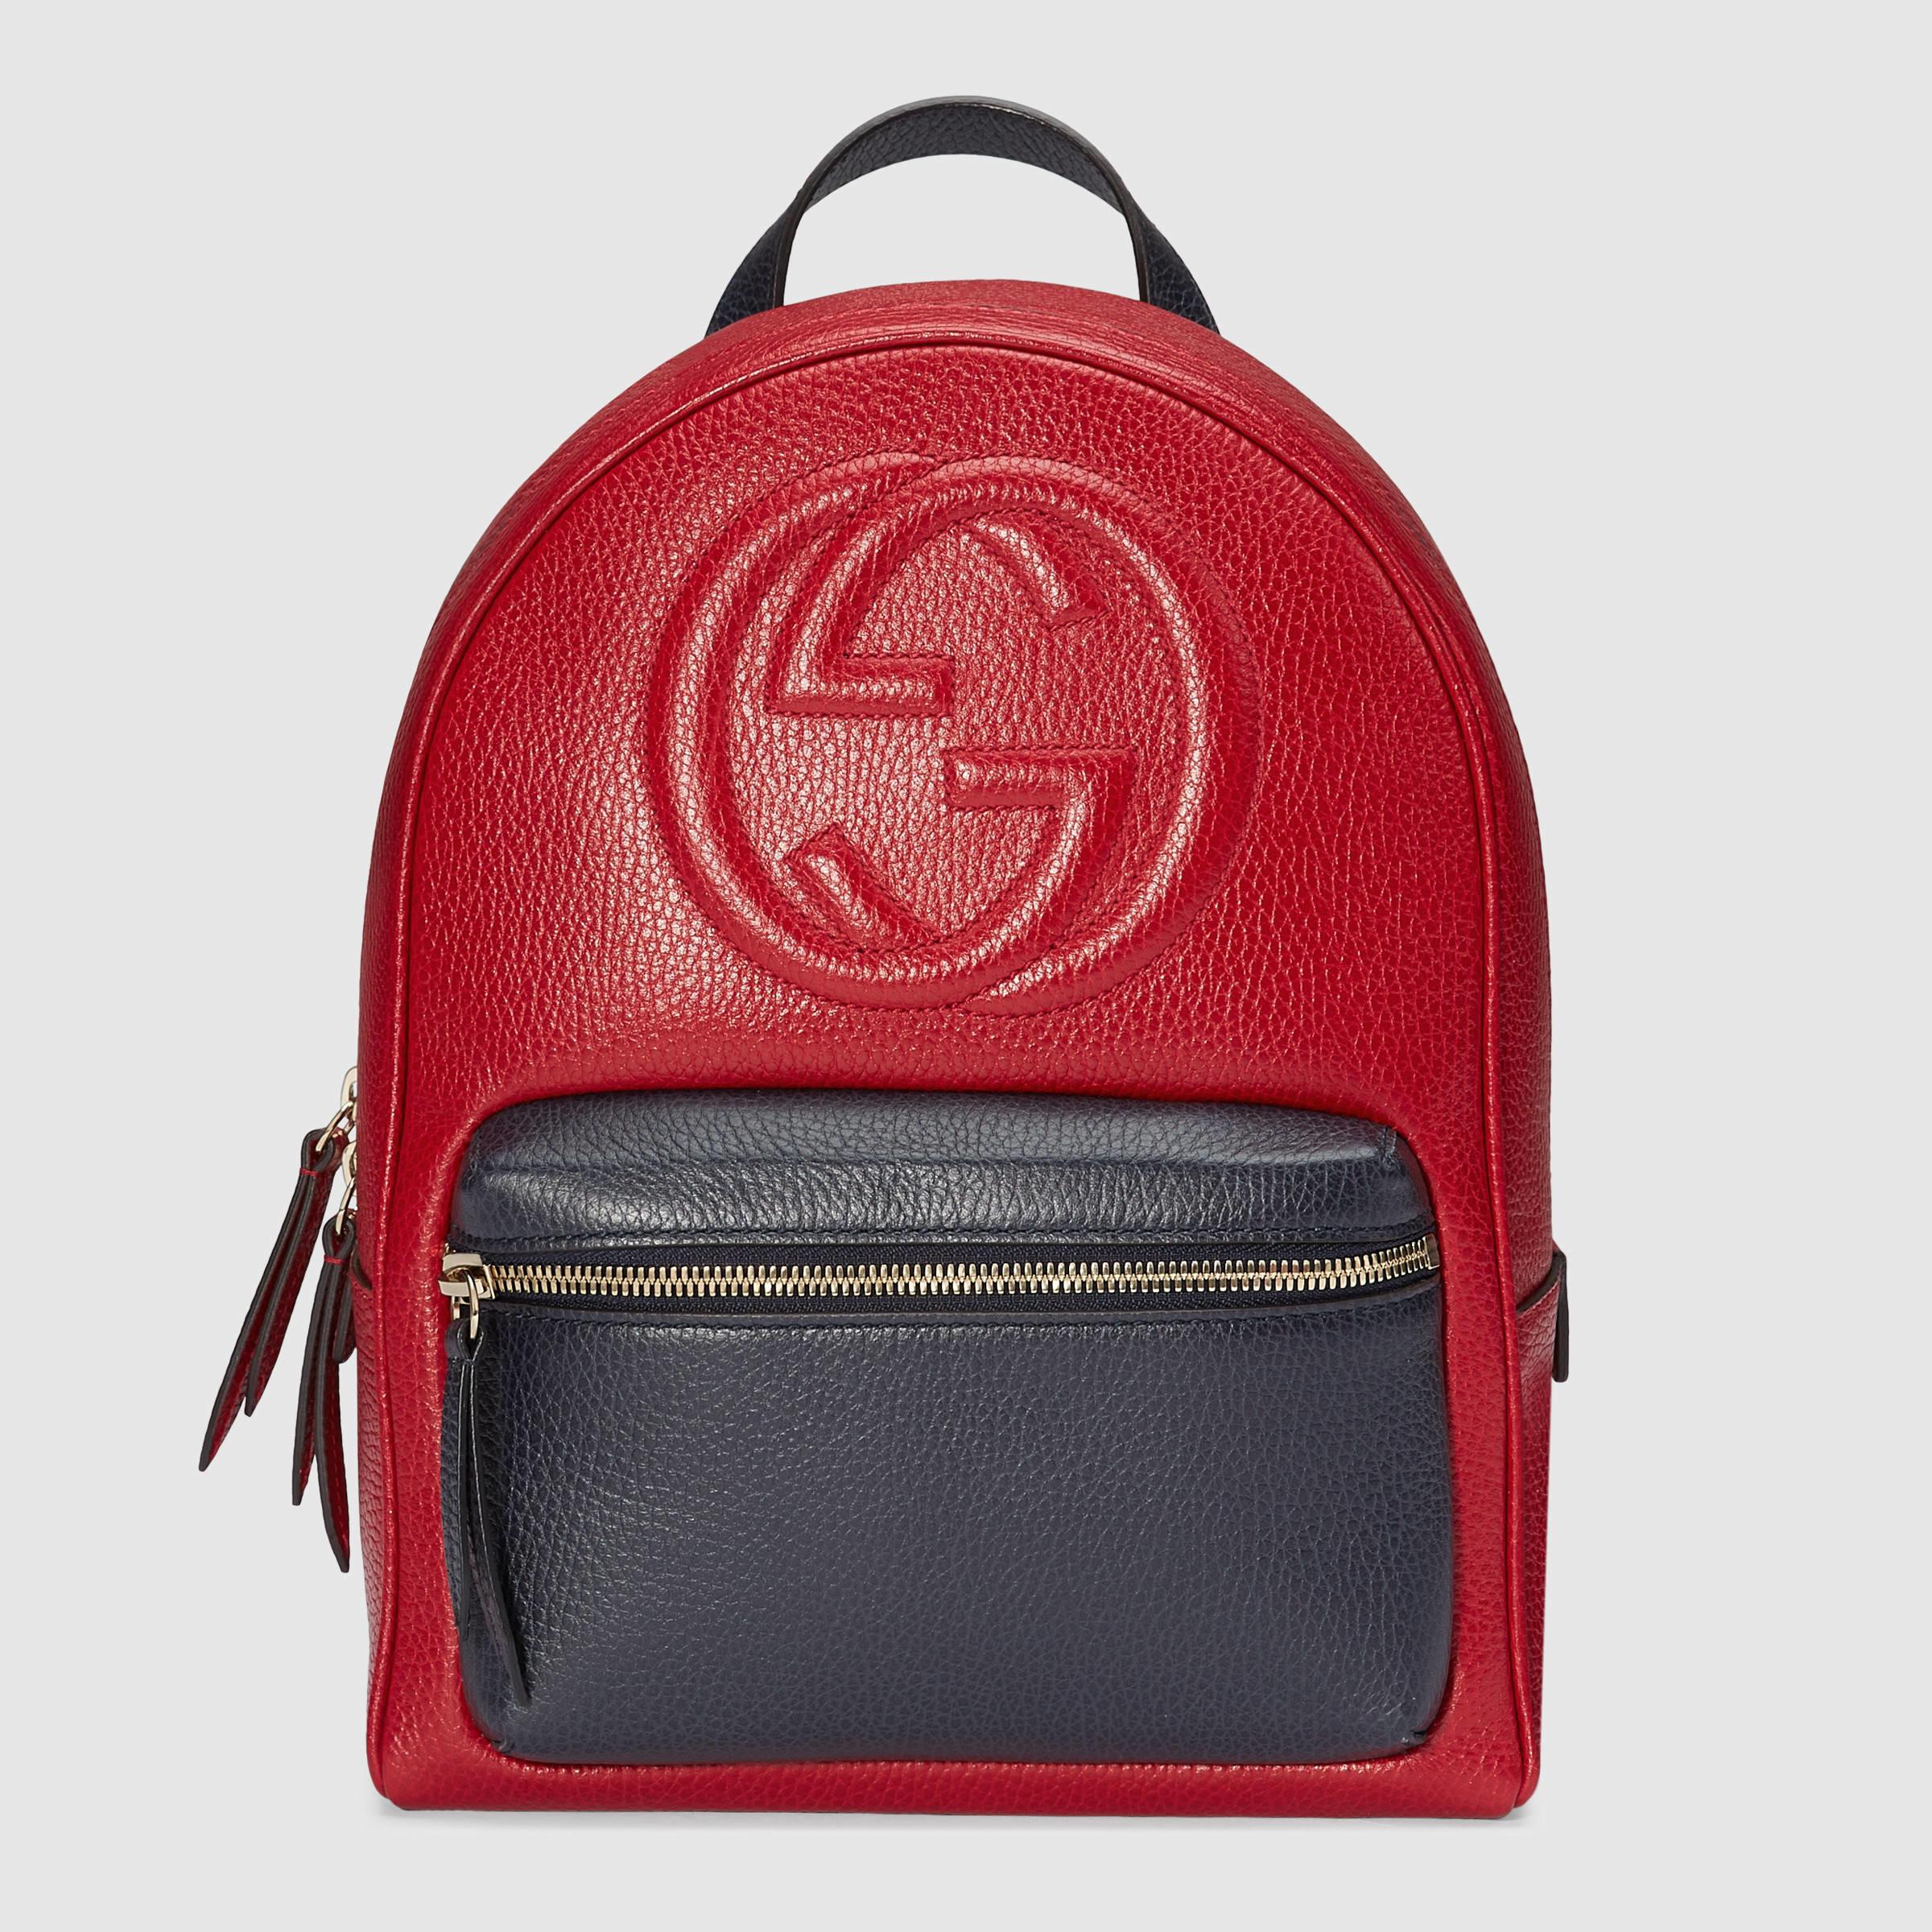 8704d45cd98b Gucci Small Backpack Black- Fenix Toulouse Handball